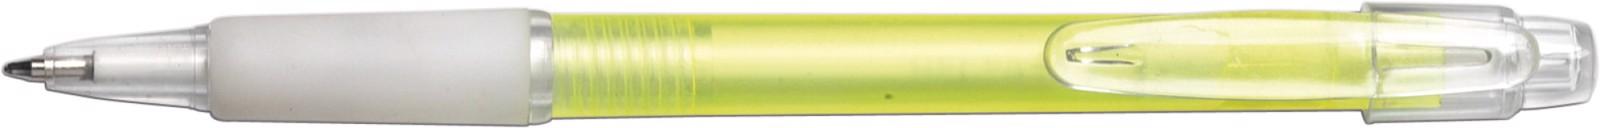 AS ballpen - Yellow